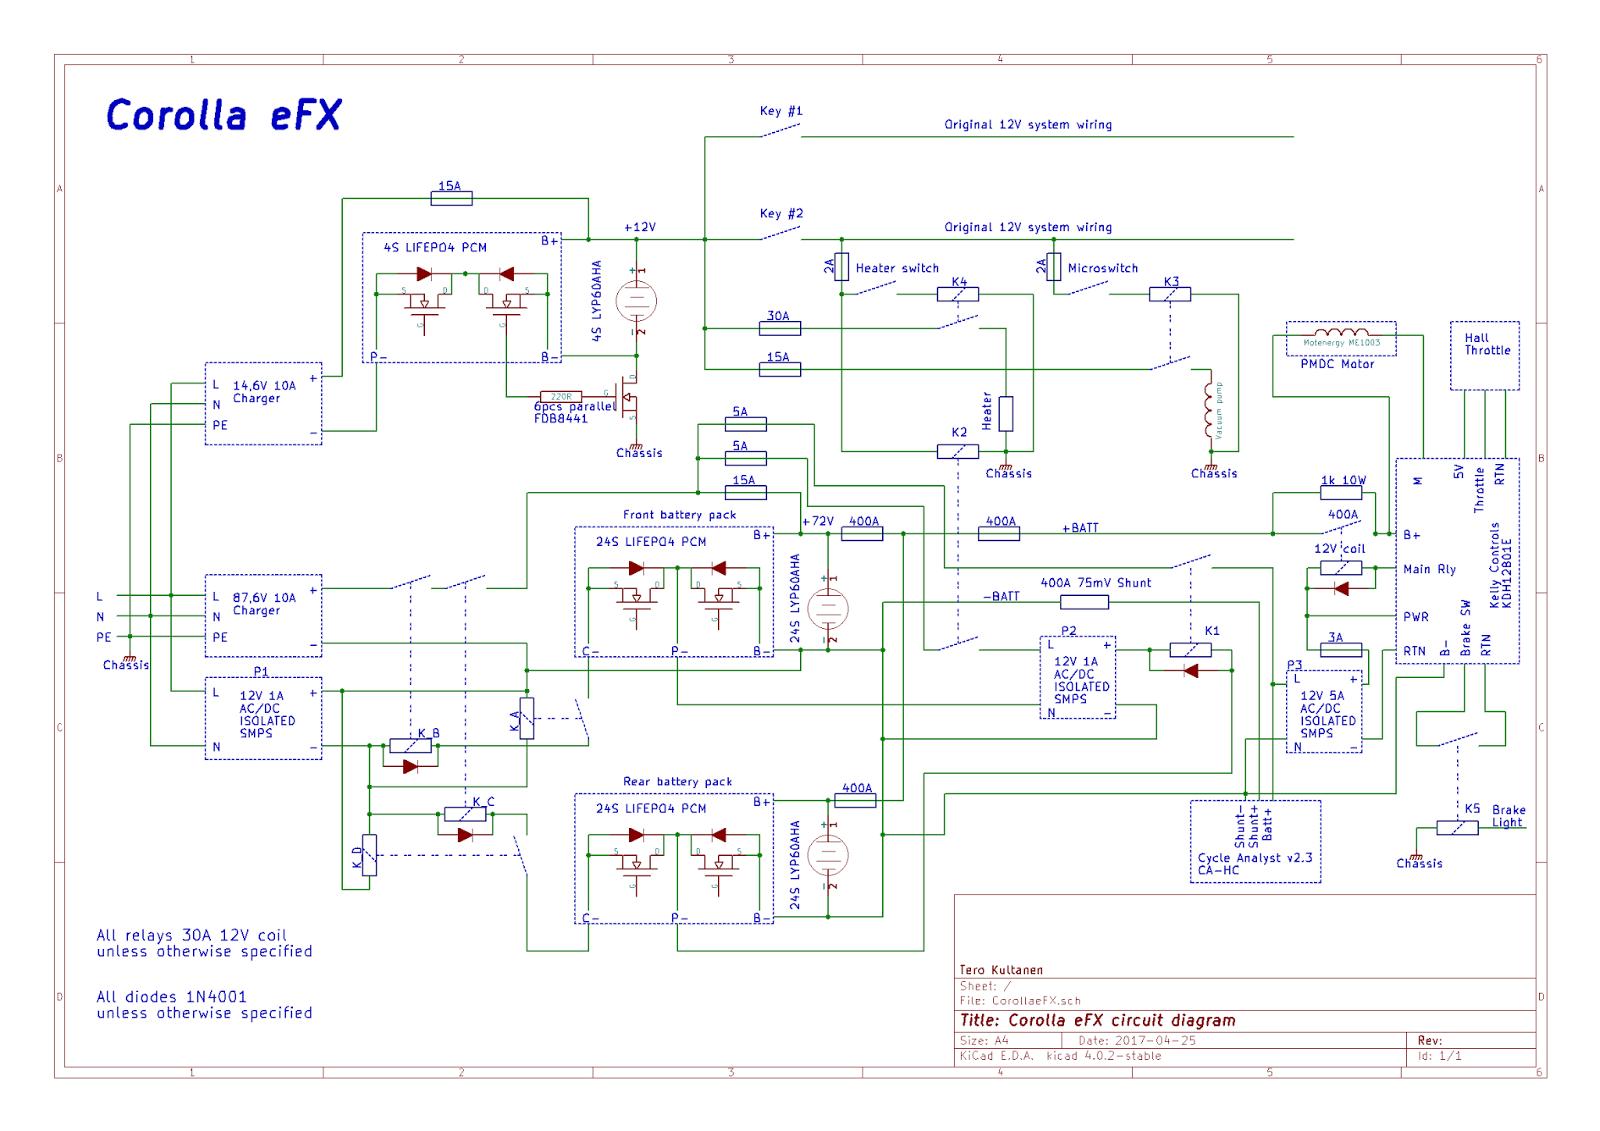 circuit diagram update 25 4 2017 [ 1600 x 1131 Pixel ]